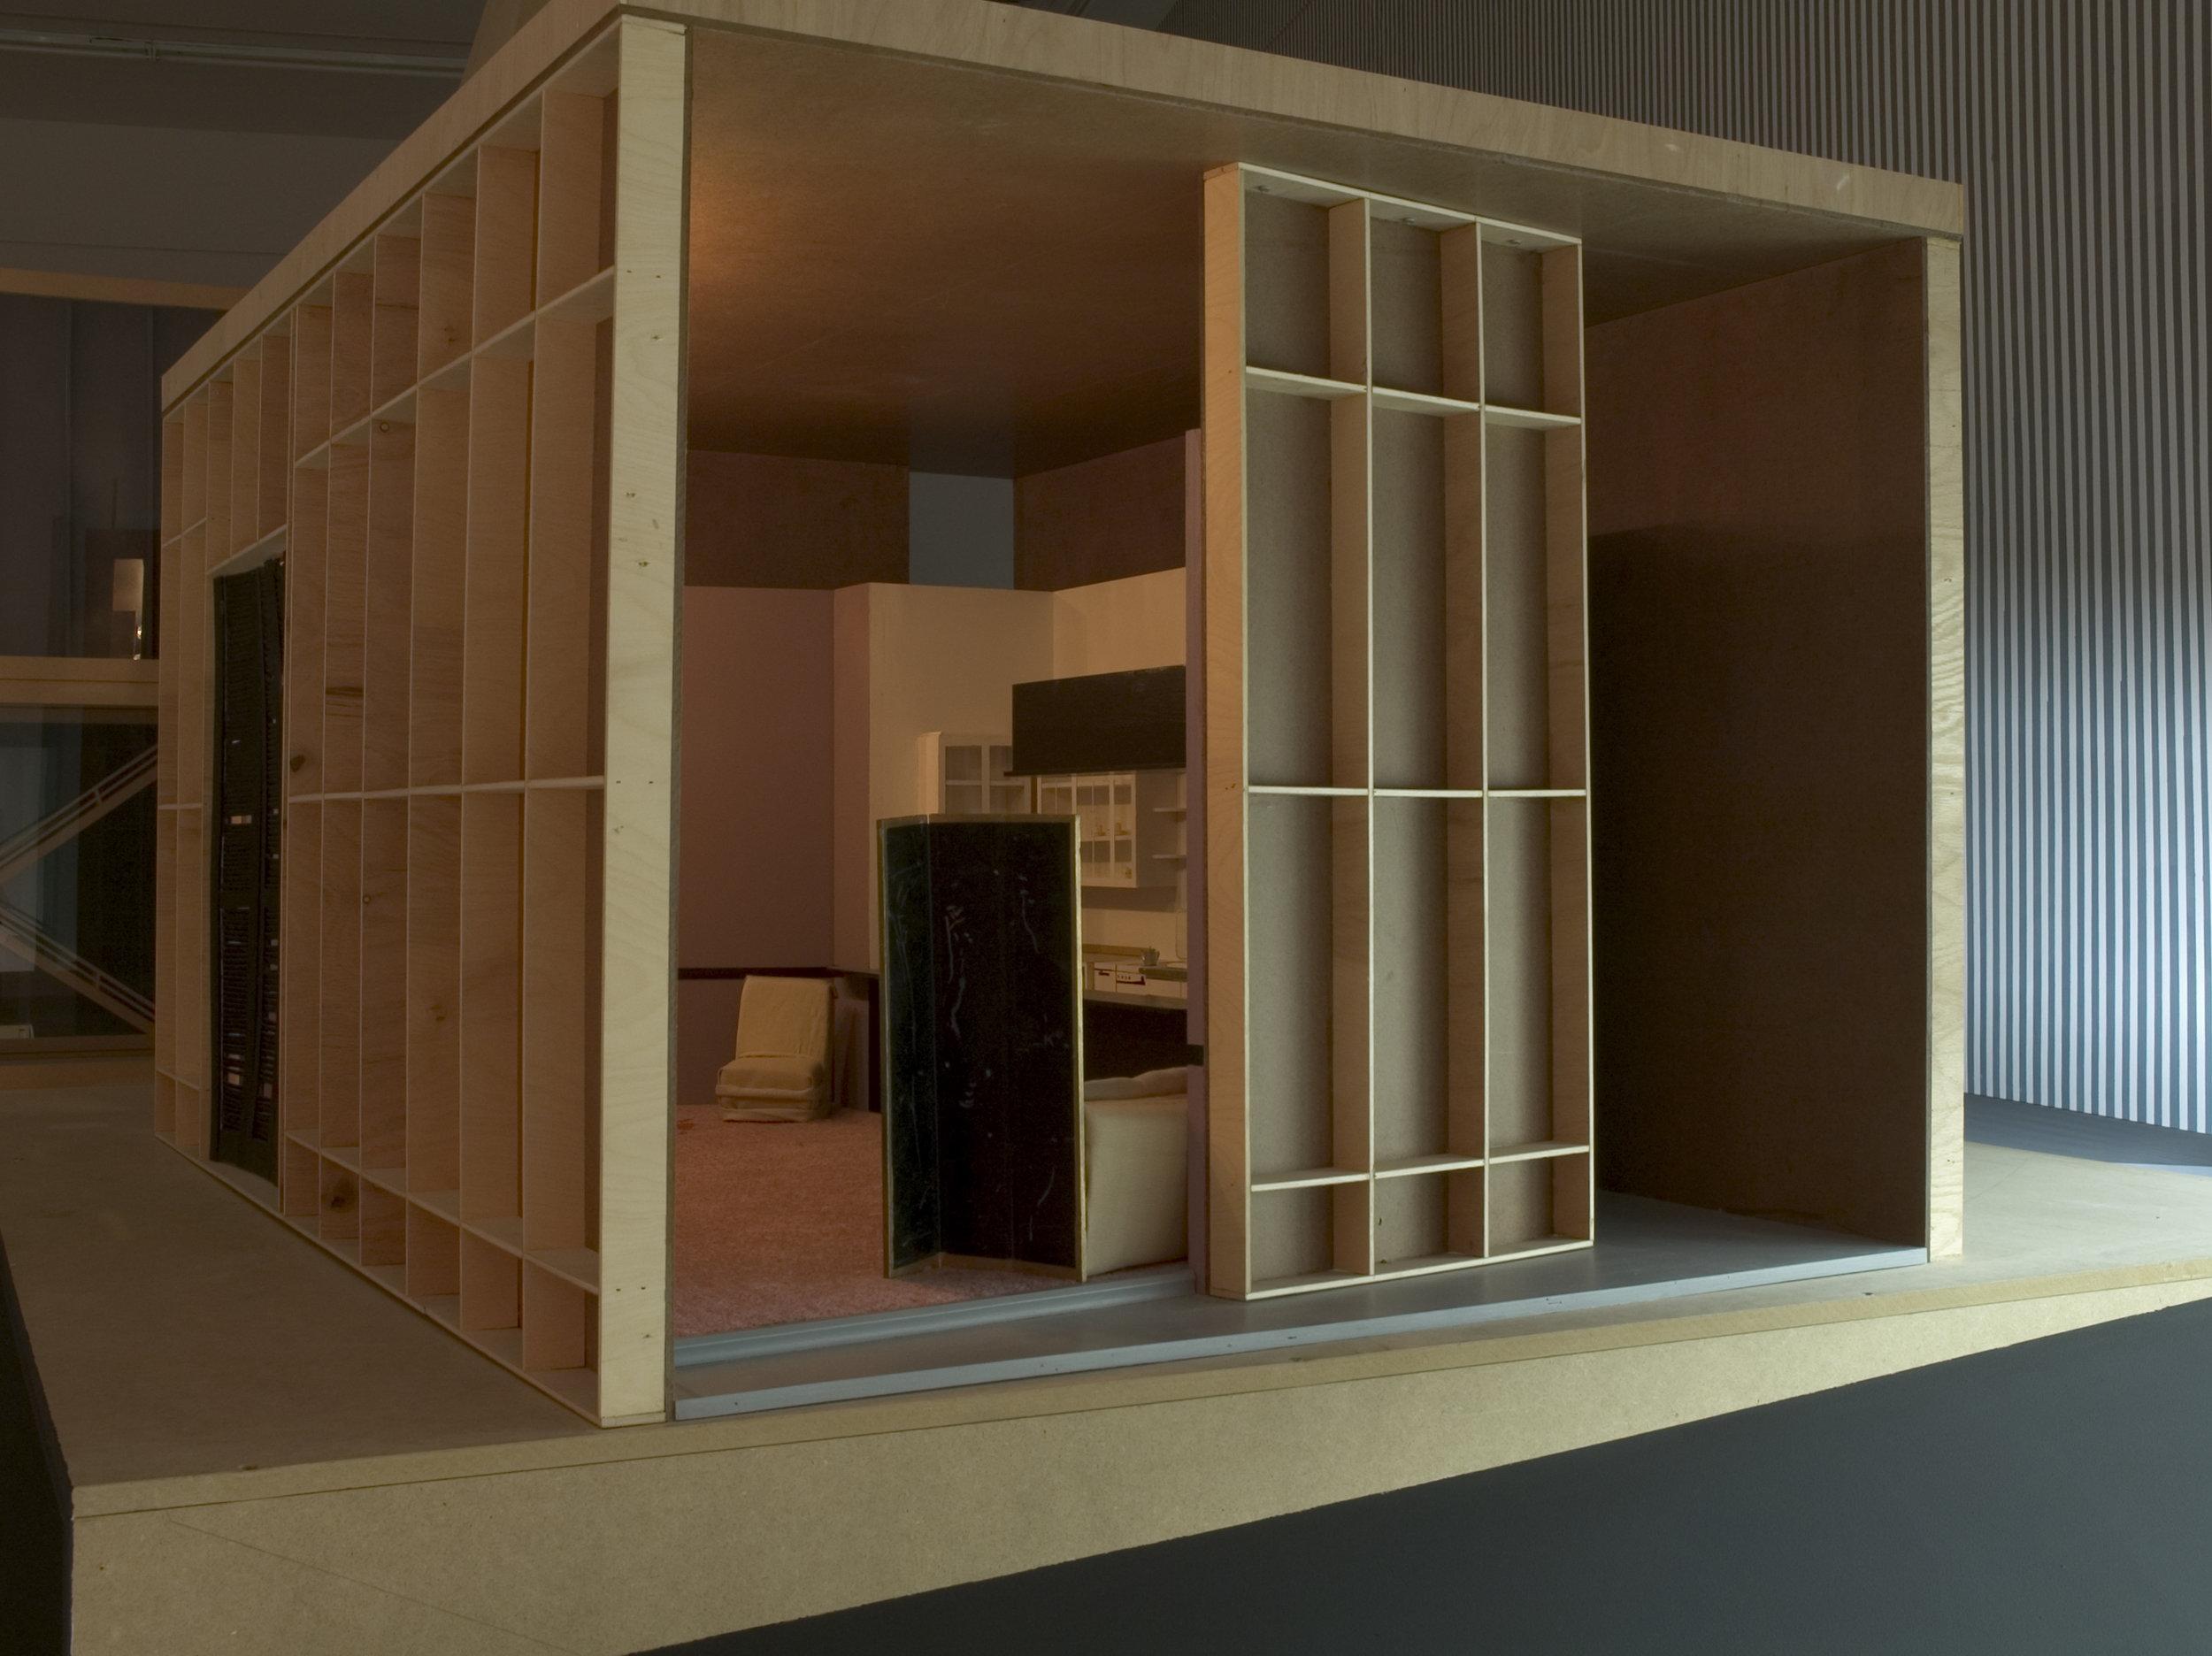 _17_main room (model).jpg